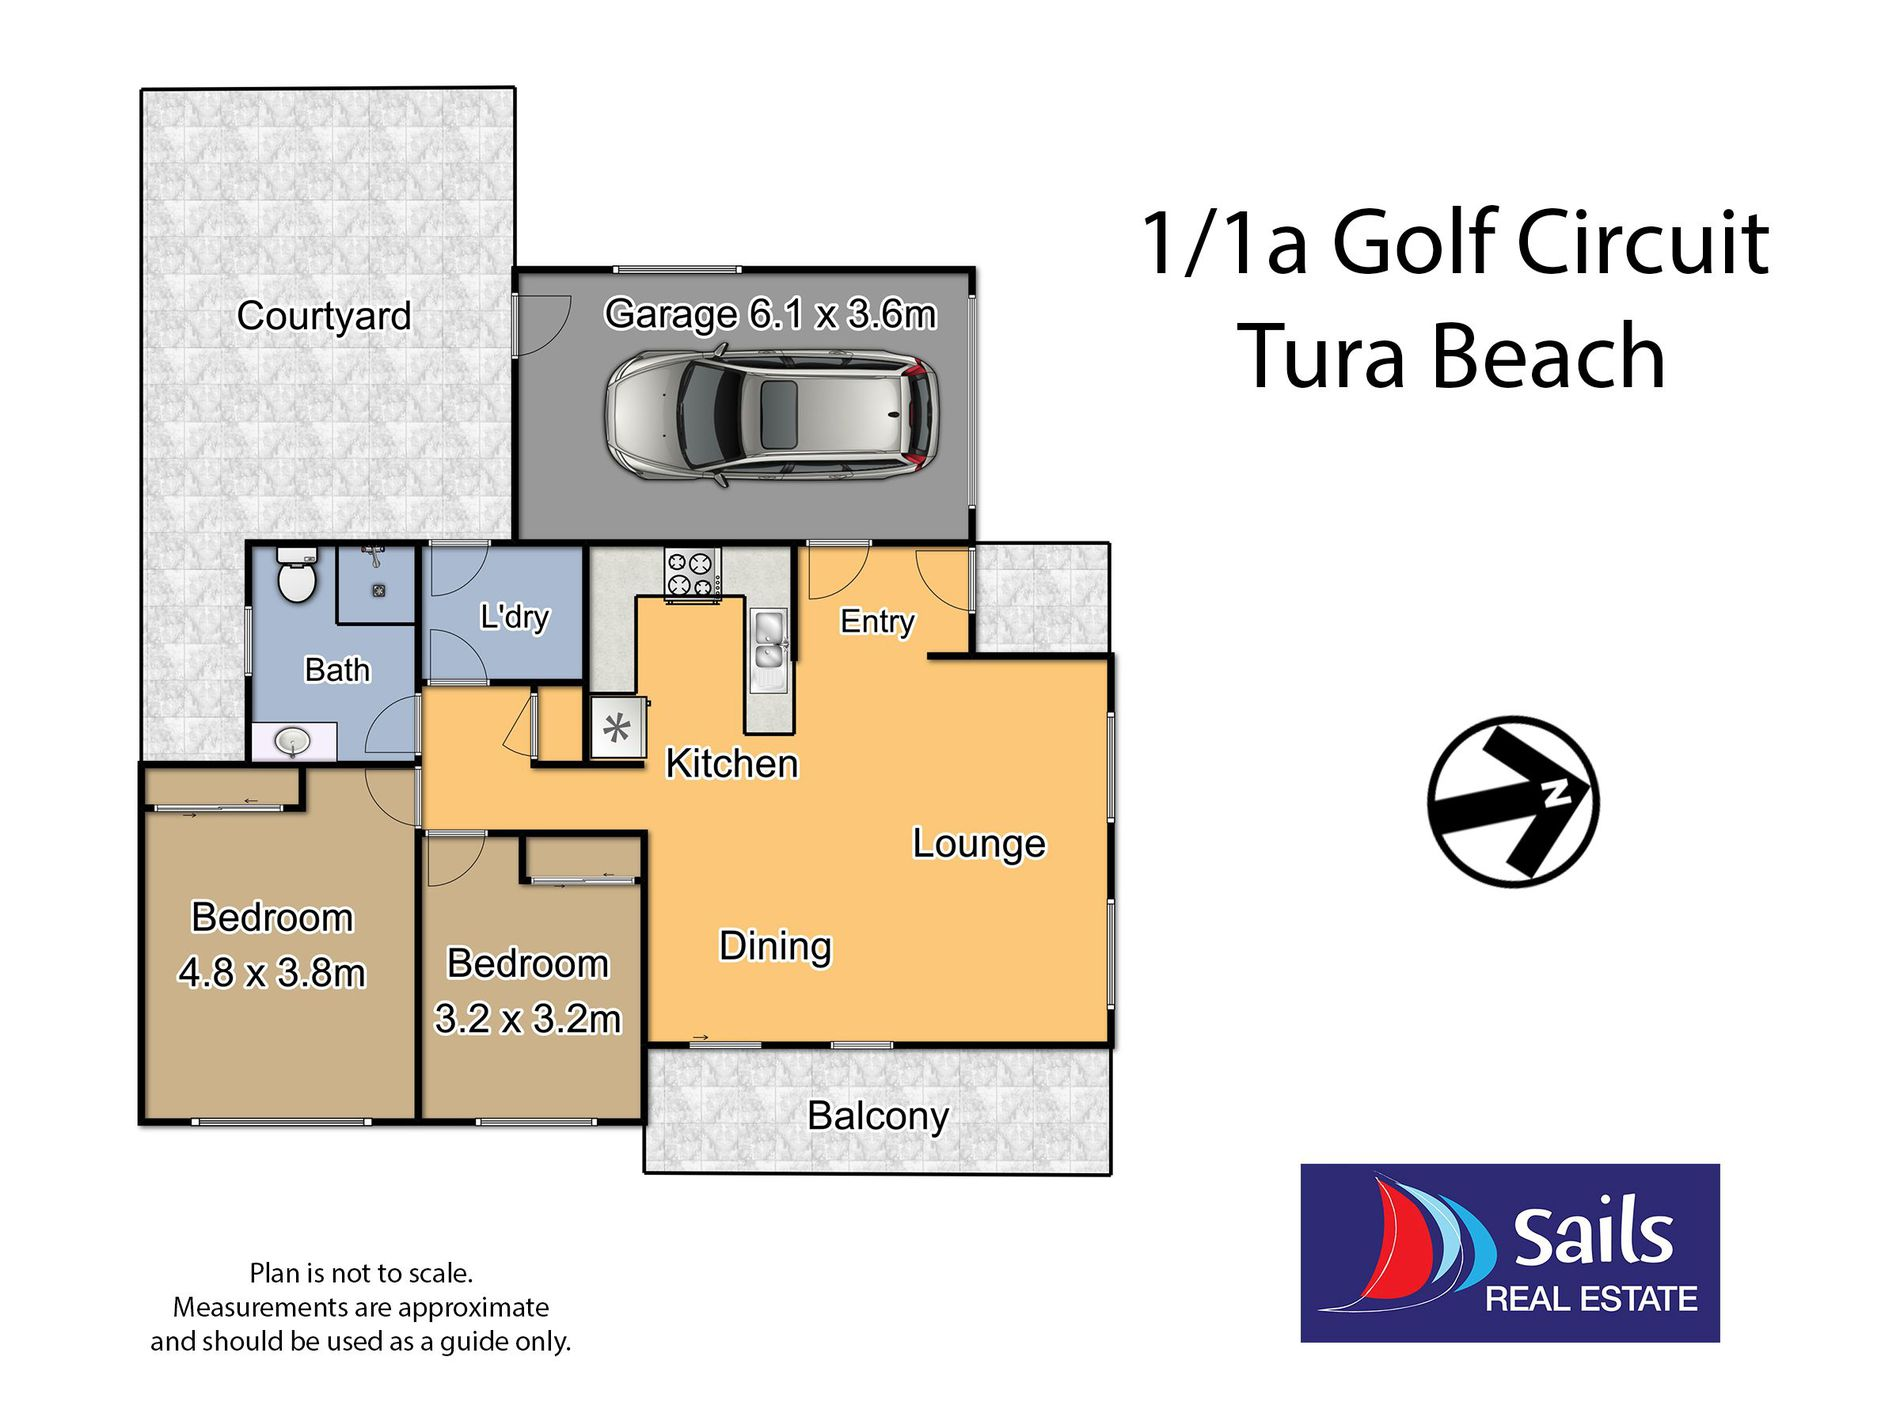 1 / 1 Golf Circuit, Tura Beach